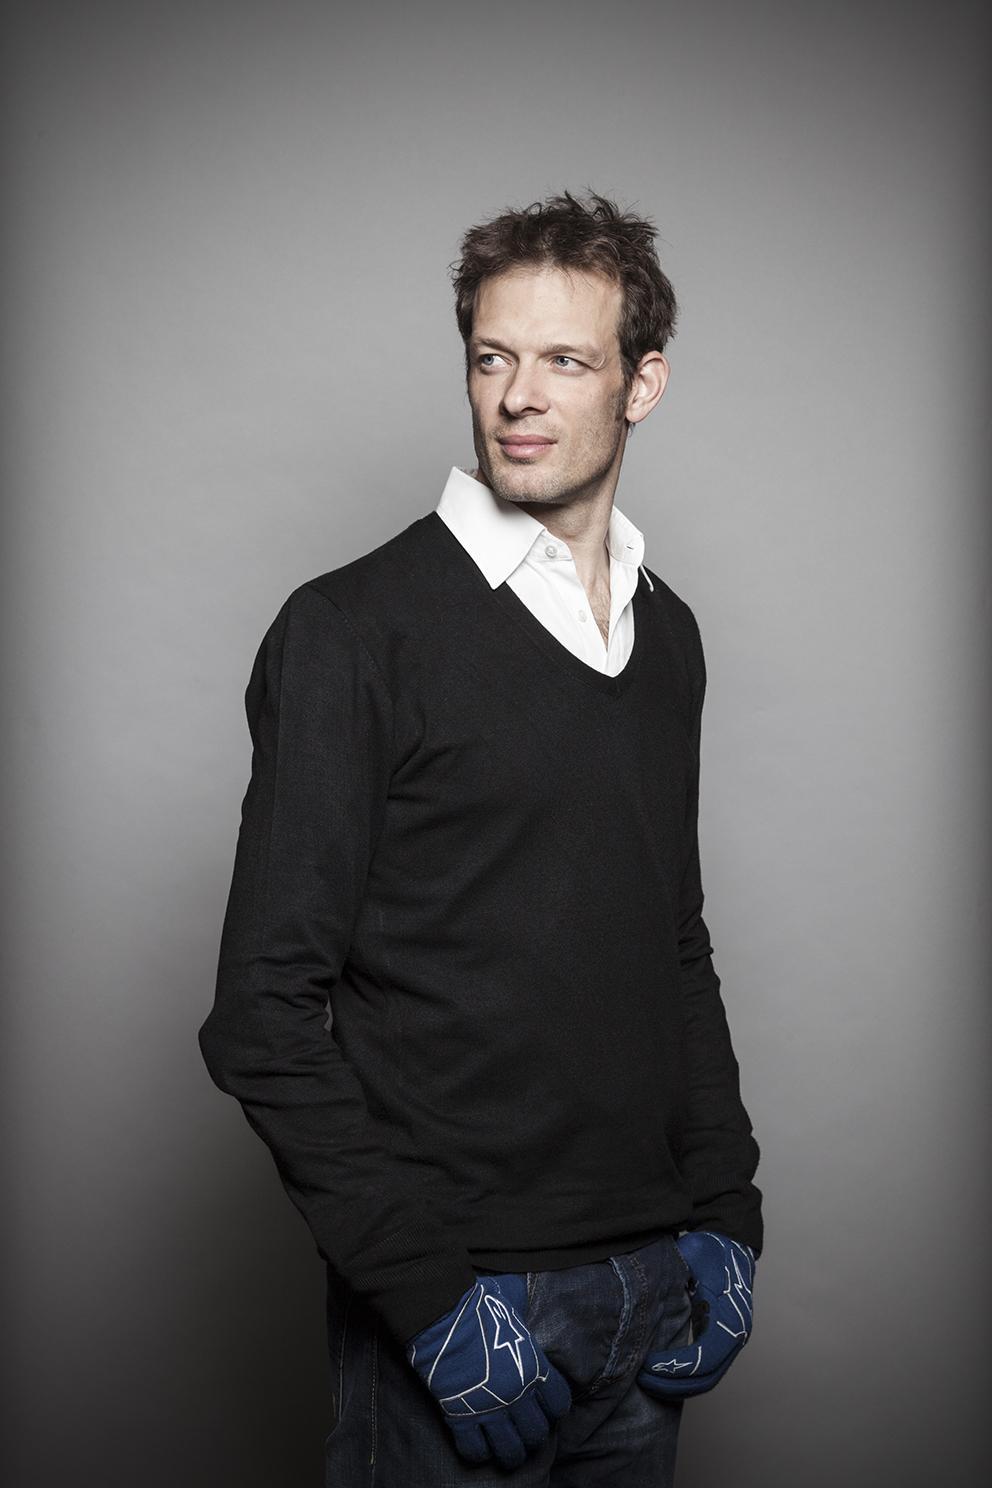 Austrian racing driver Alexander Wurz